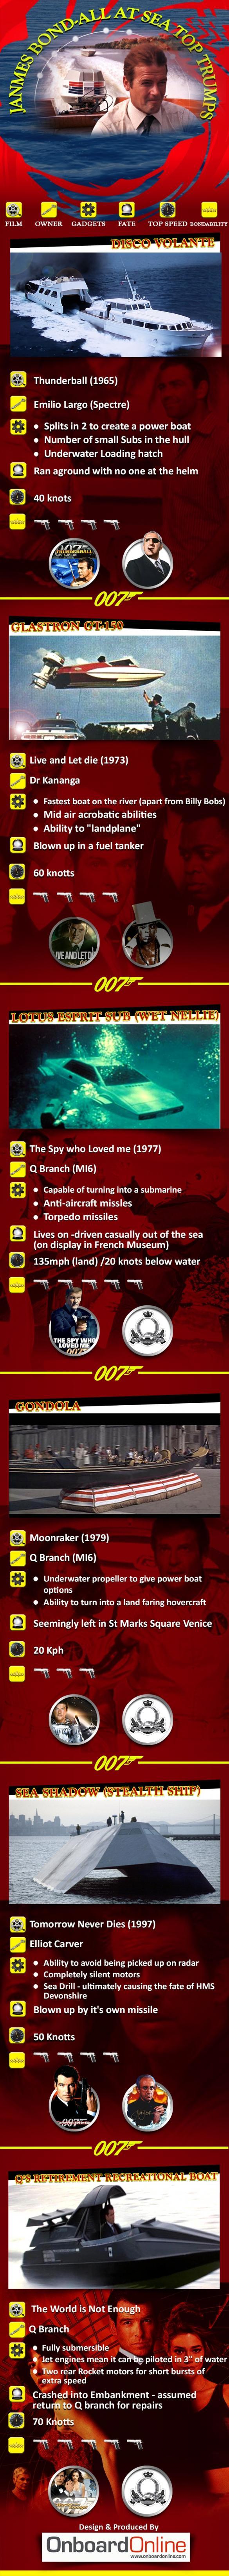 James Bond Top Trumps Infographic